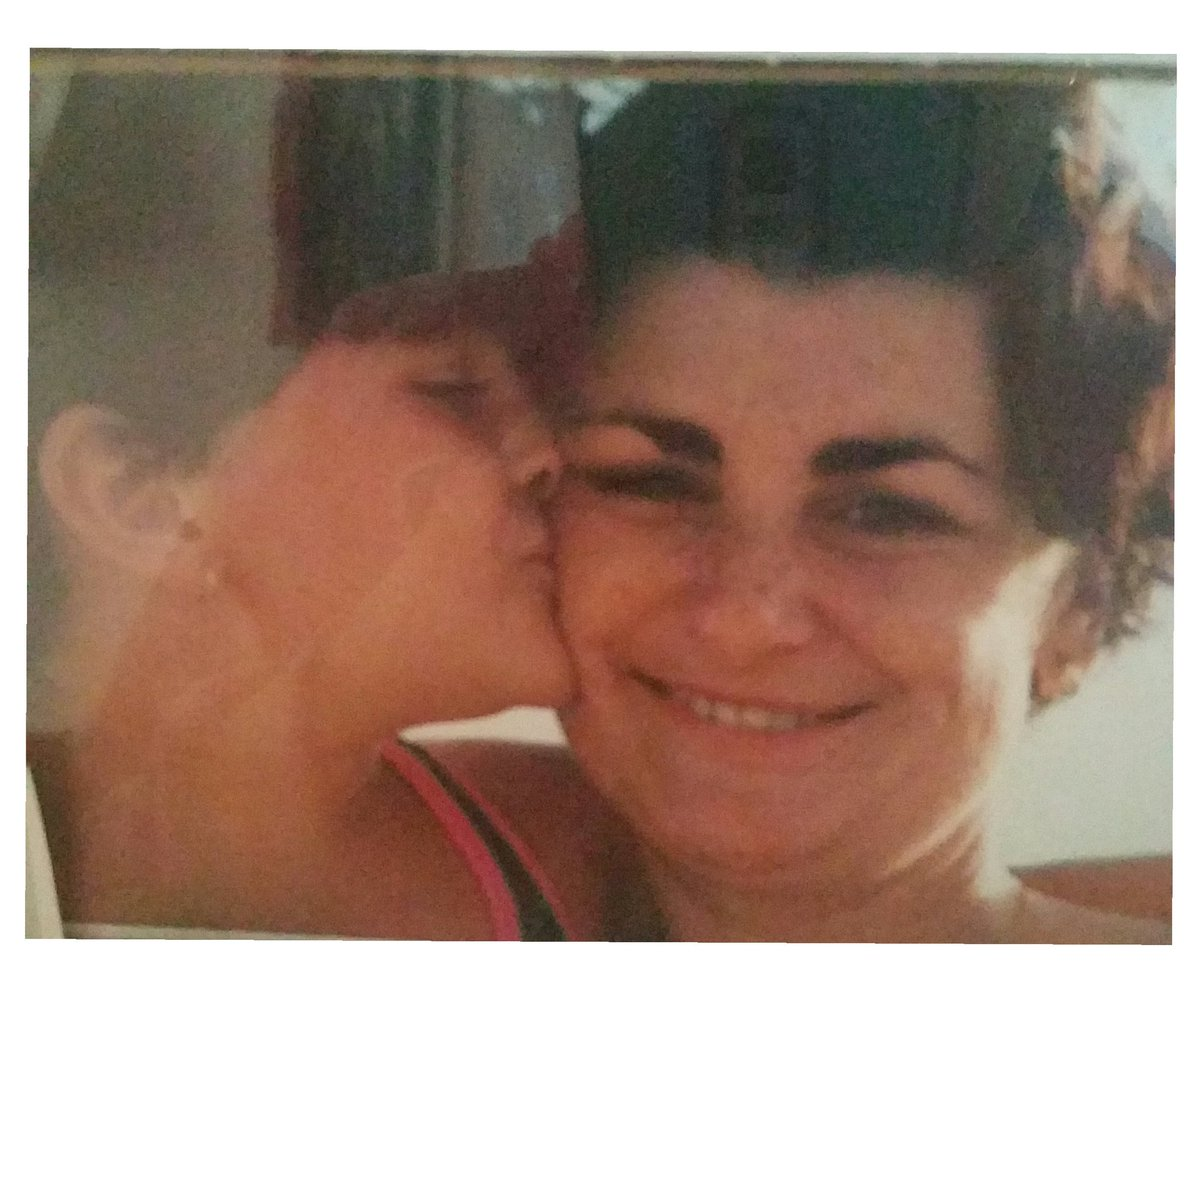 Mi mama bella ♡ https://t.co/1flgyMBZmw